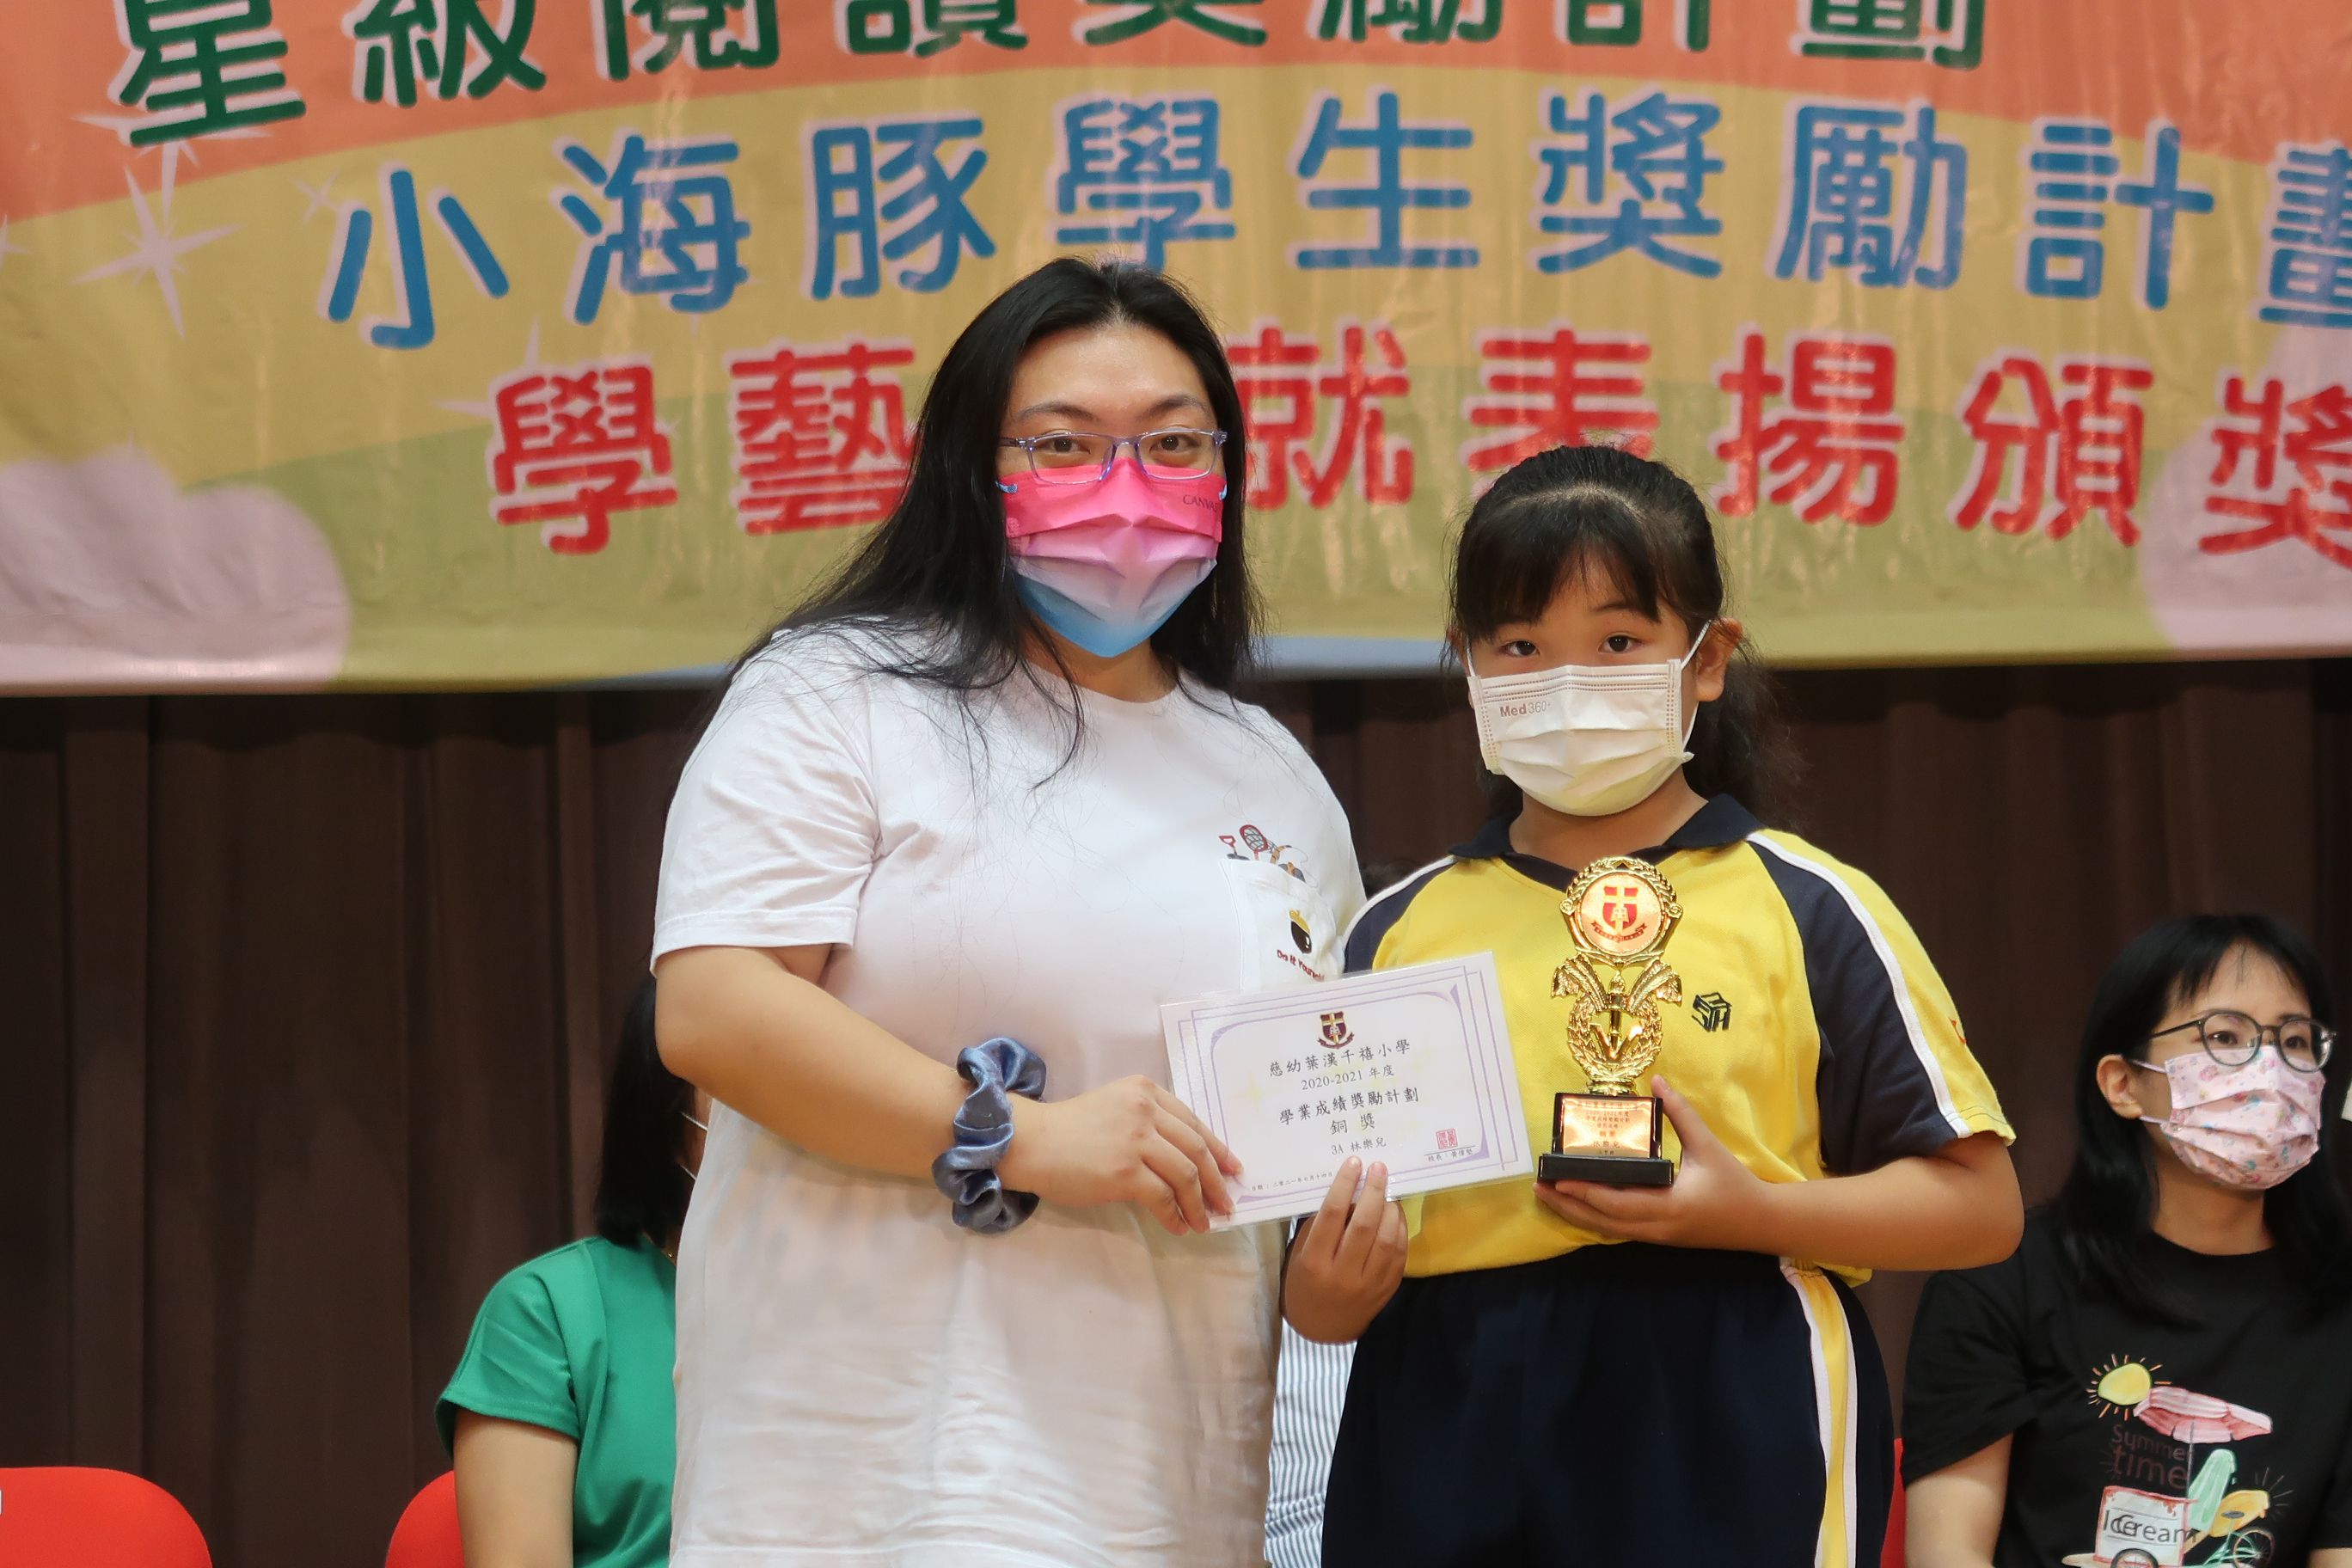 https://syh.edu.hk/sites/default/files/img_5573.jpg